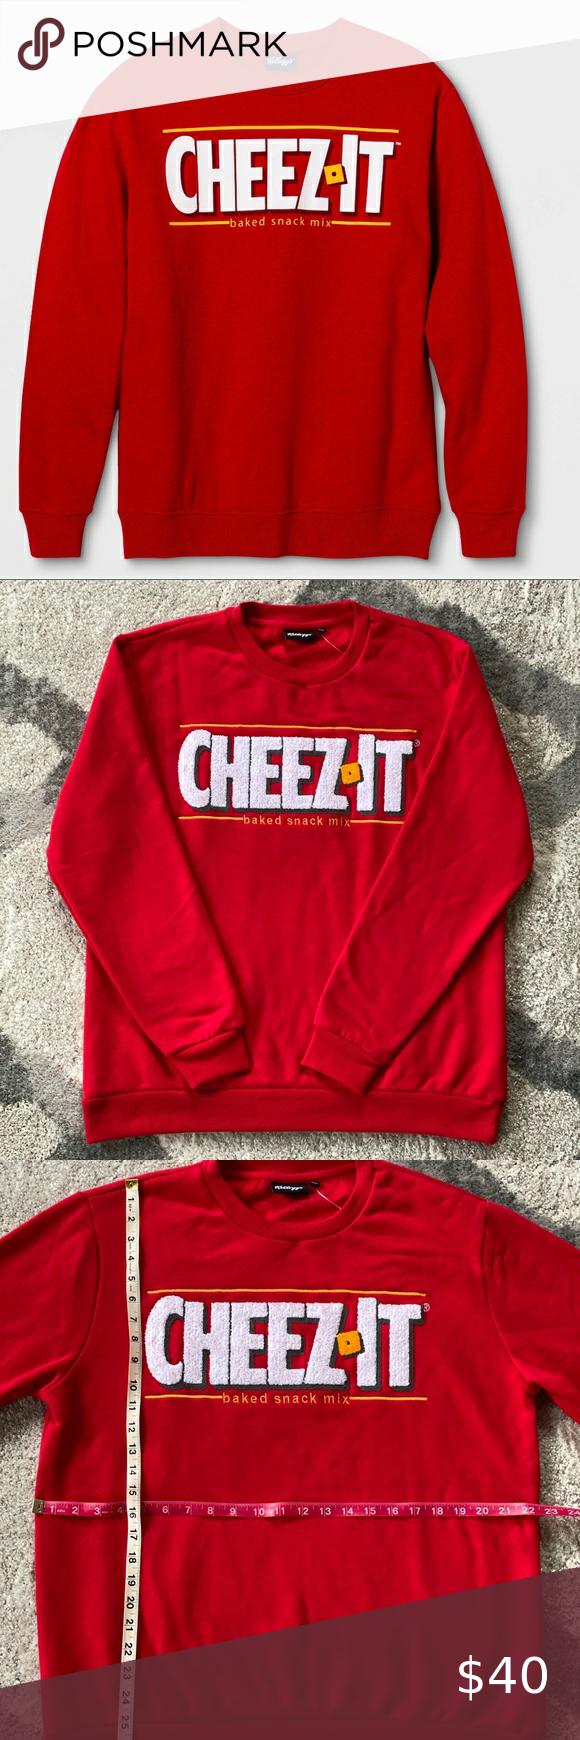 Nwt Kellogg S Cheez It Logo Crewneck Lg Clothes Design Sweatshirt Shirt Fashion